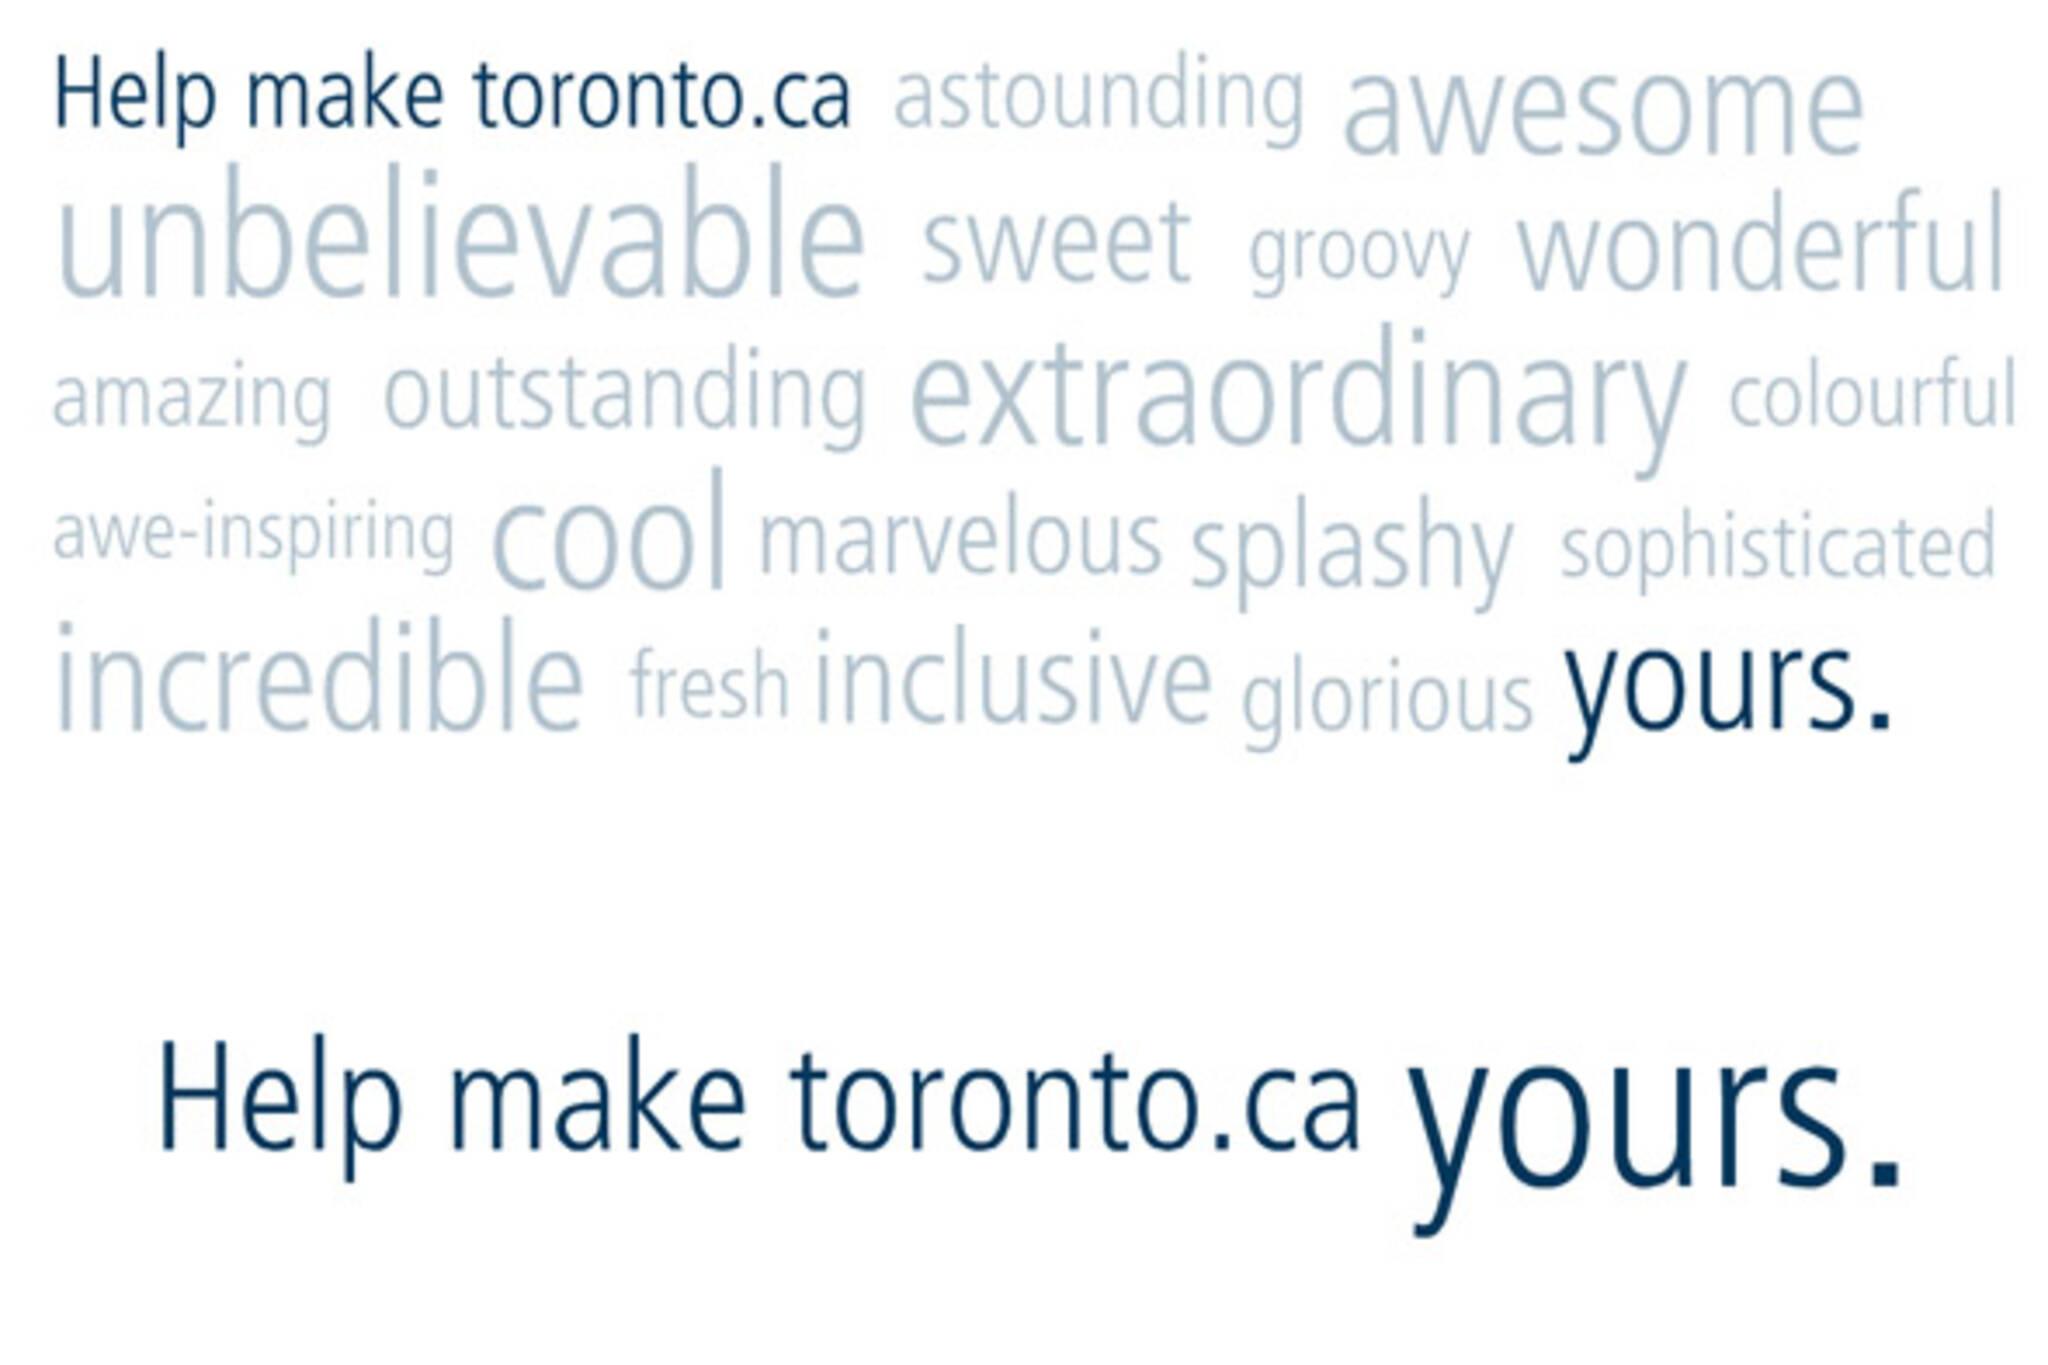 The Toronto.ca rebrand.